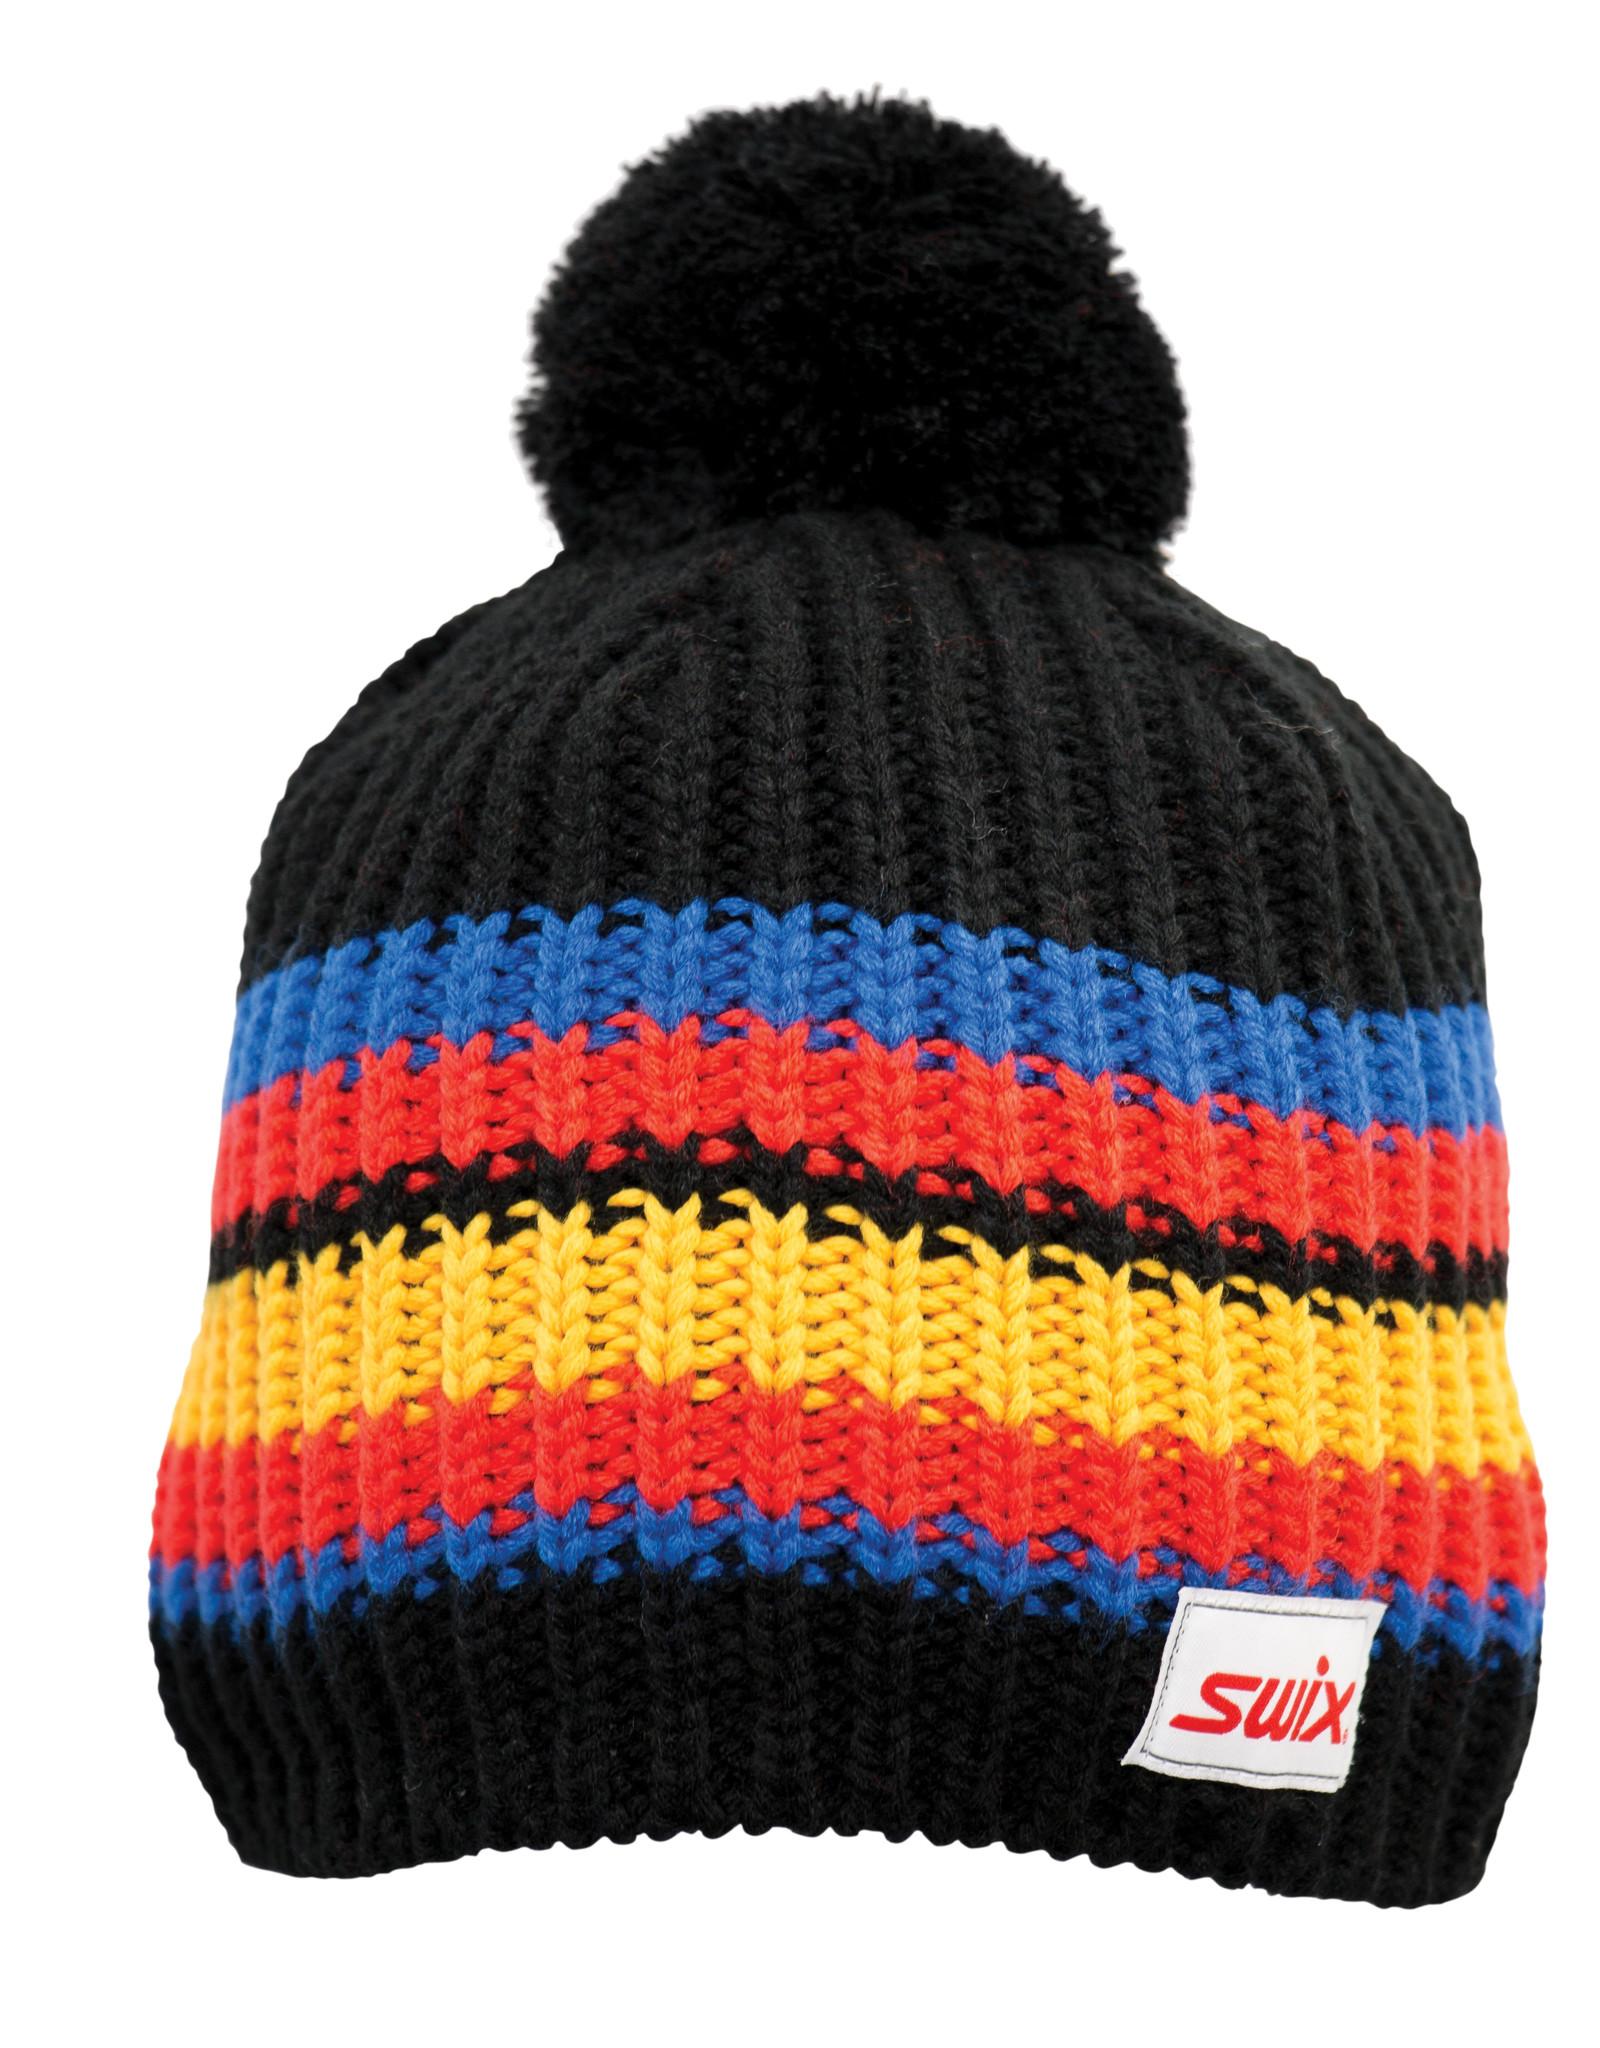 Swix Ace Hat Black